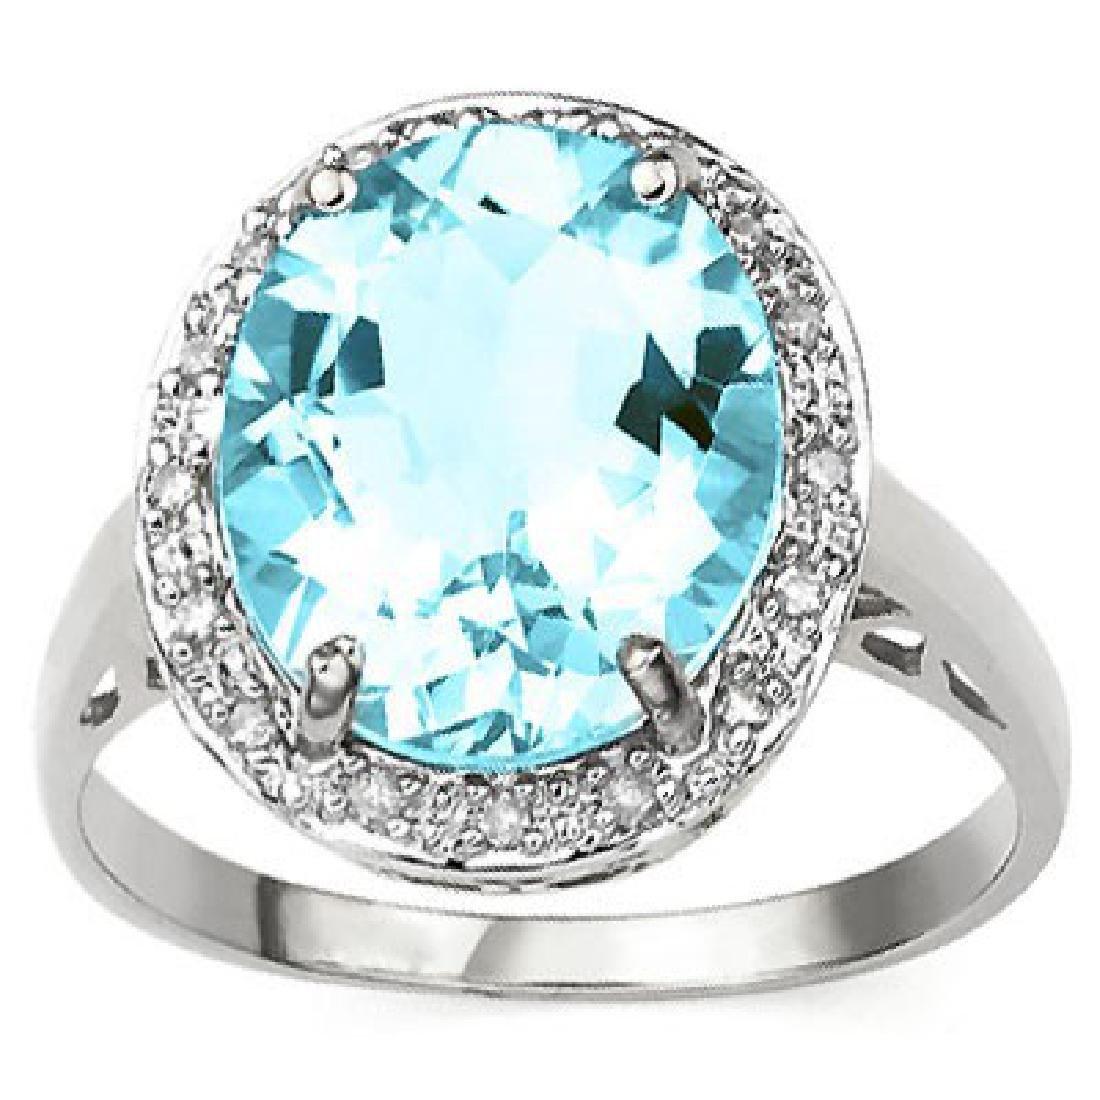 HUGE 6CT OVAL CUT BLUE TOPAZ/DIAMOND ESTATE RING